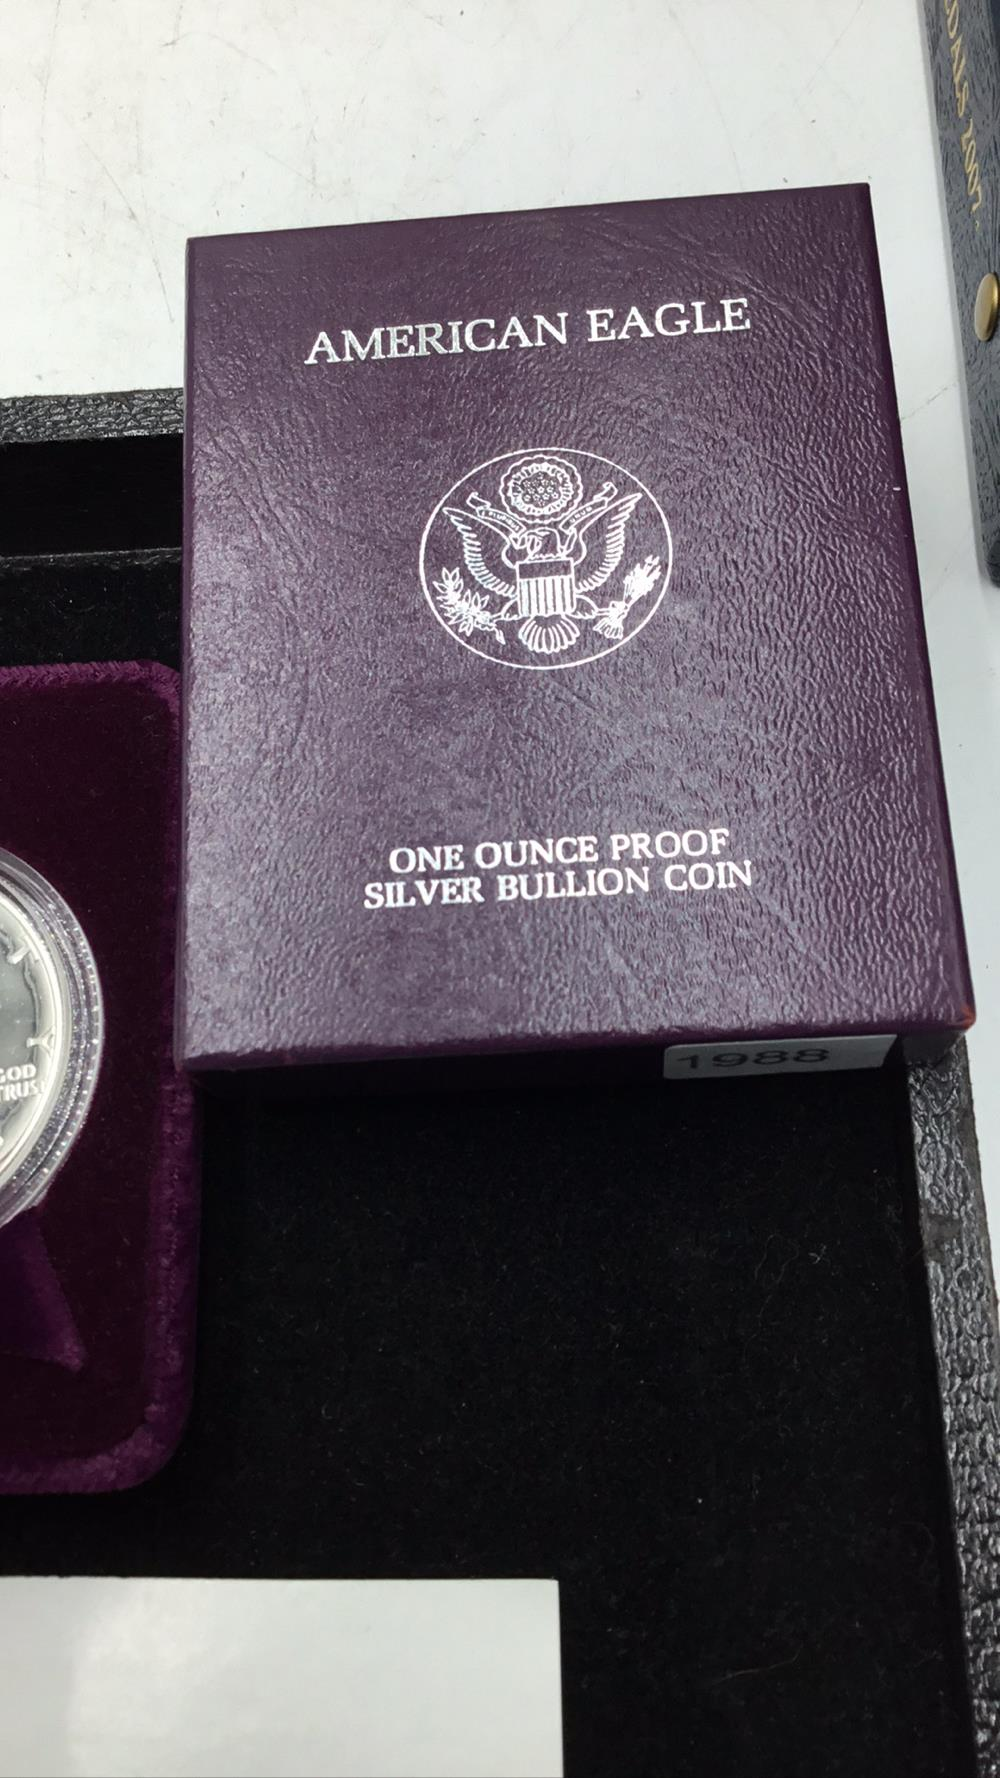 Lot 140: American eagle 1 ounce proof silver bullion coin